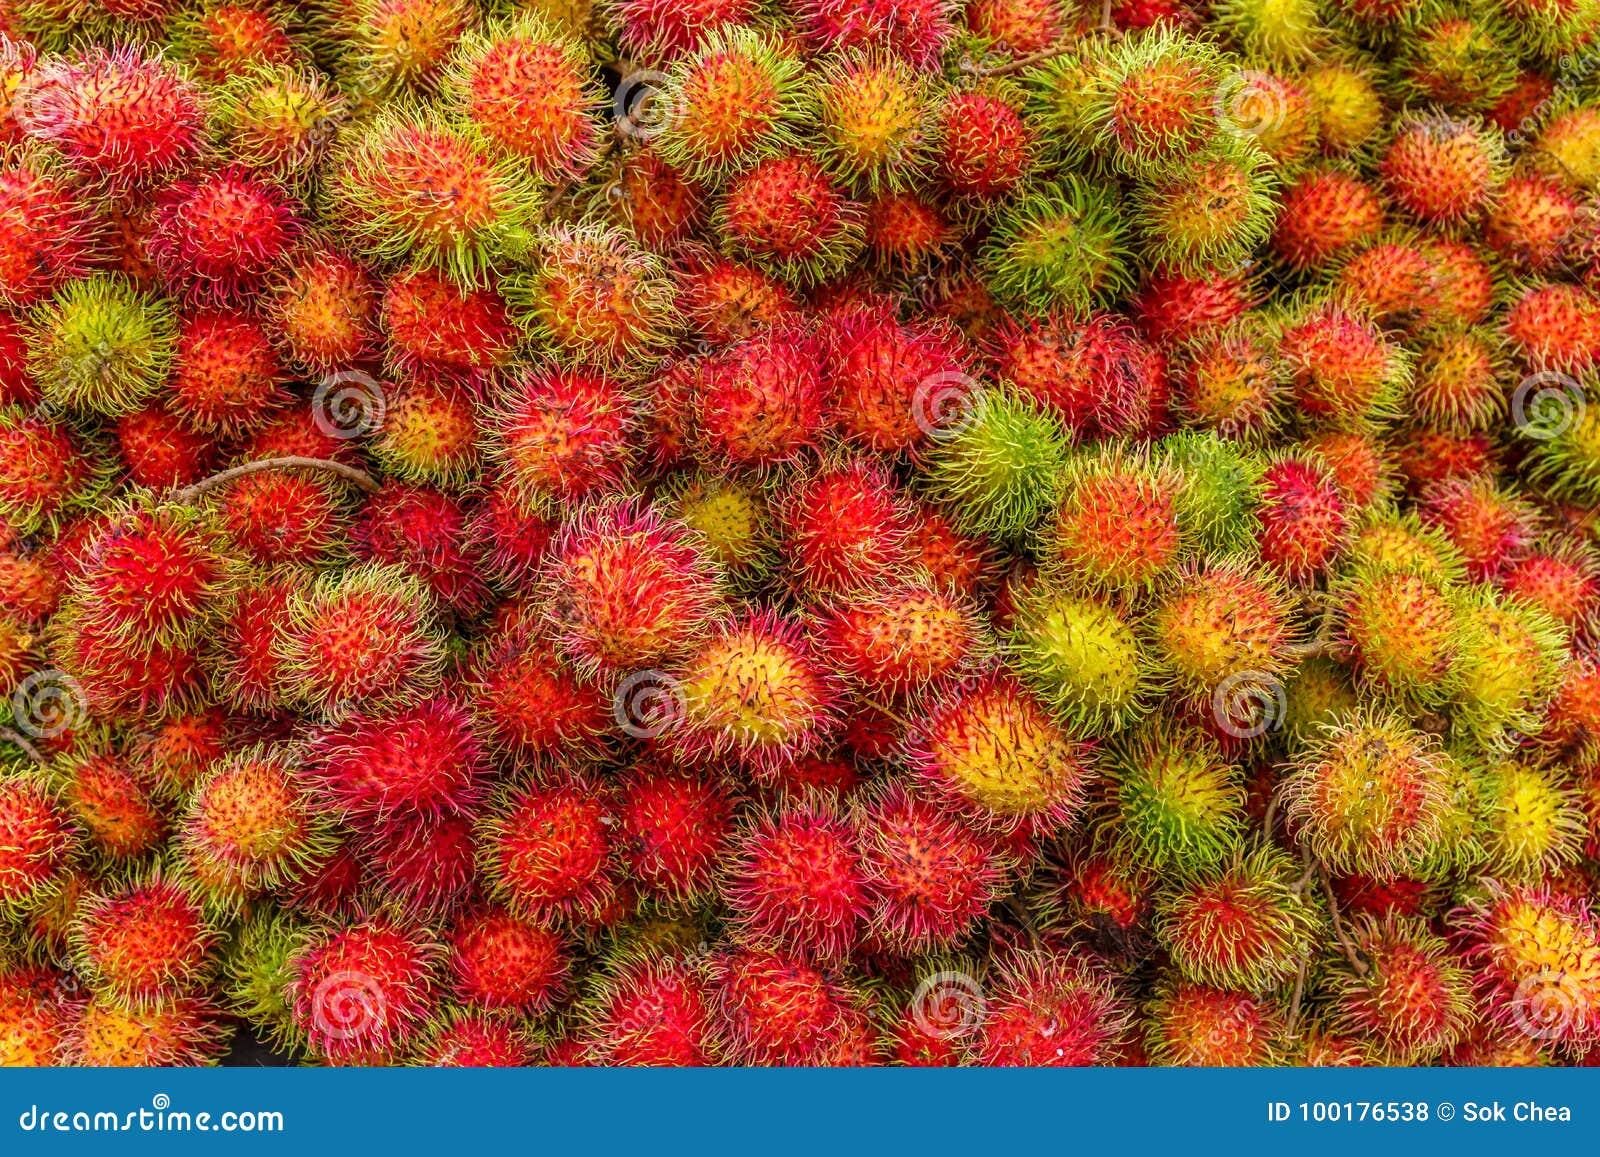 Ripe Rambutan the Popular Juicy Sweet Tropical Fruit Serving as